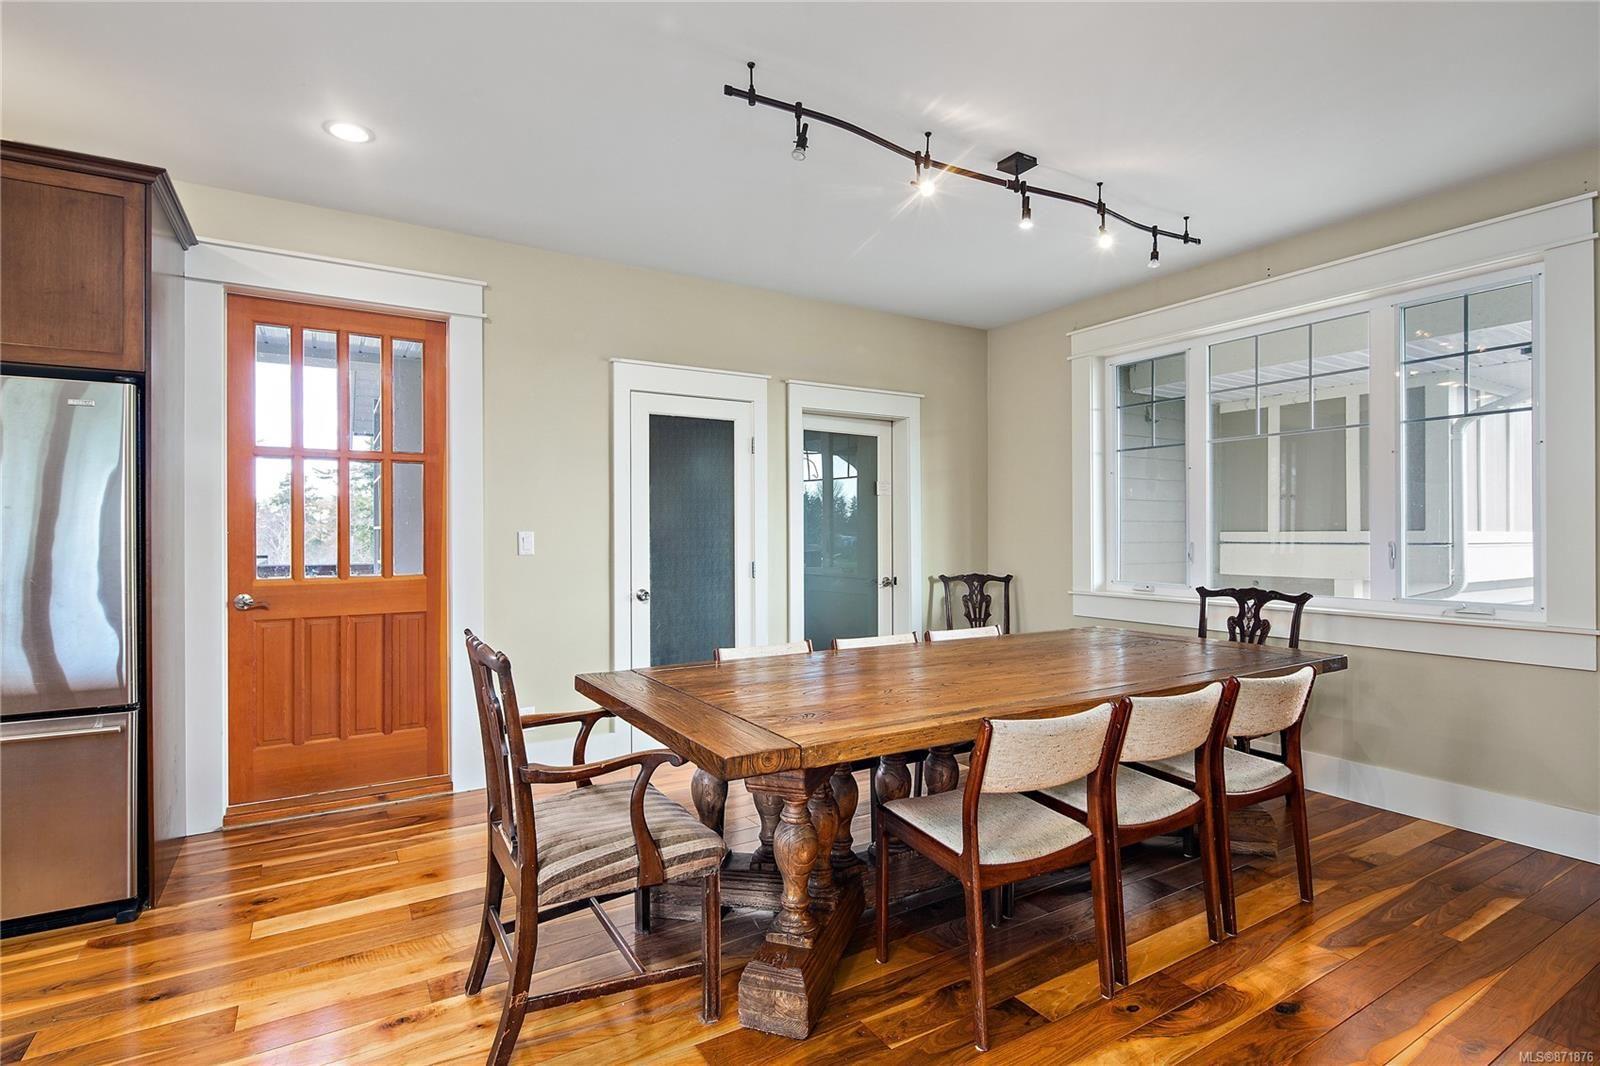 Photo 15: Photos: 4420 Wilkinson Rd in : SW Royal Oak House for sale (Saanich West)  : MLS®# 871876